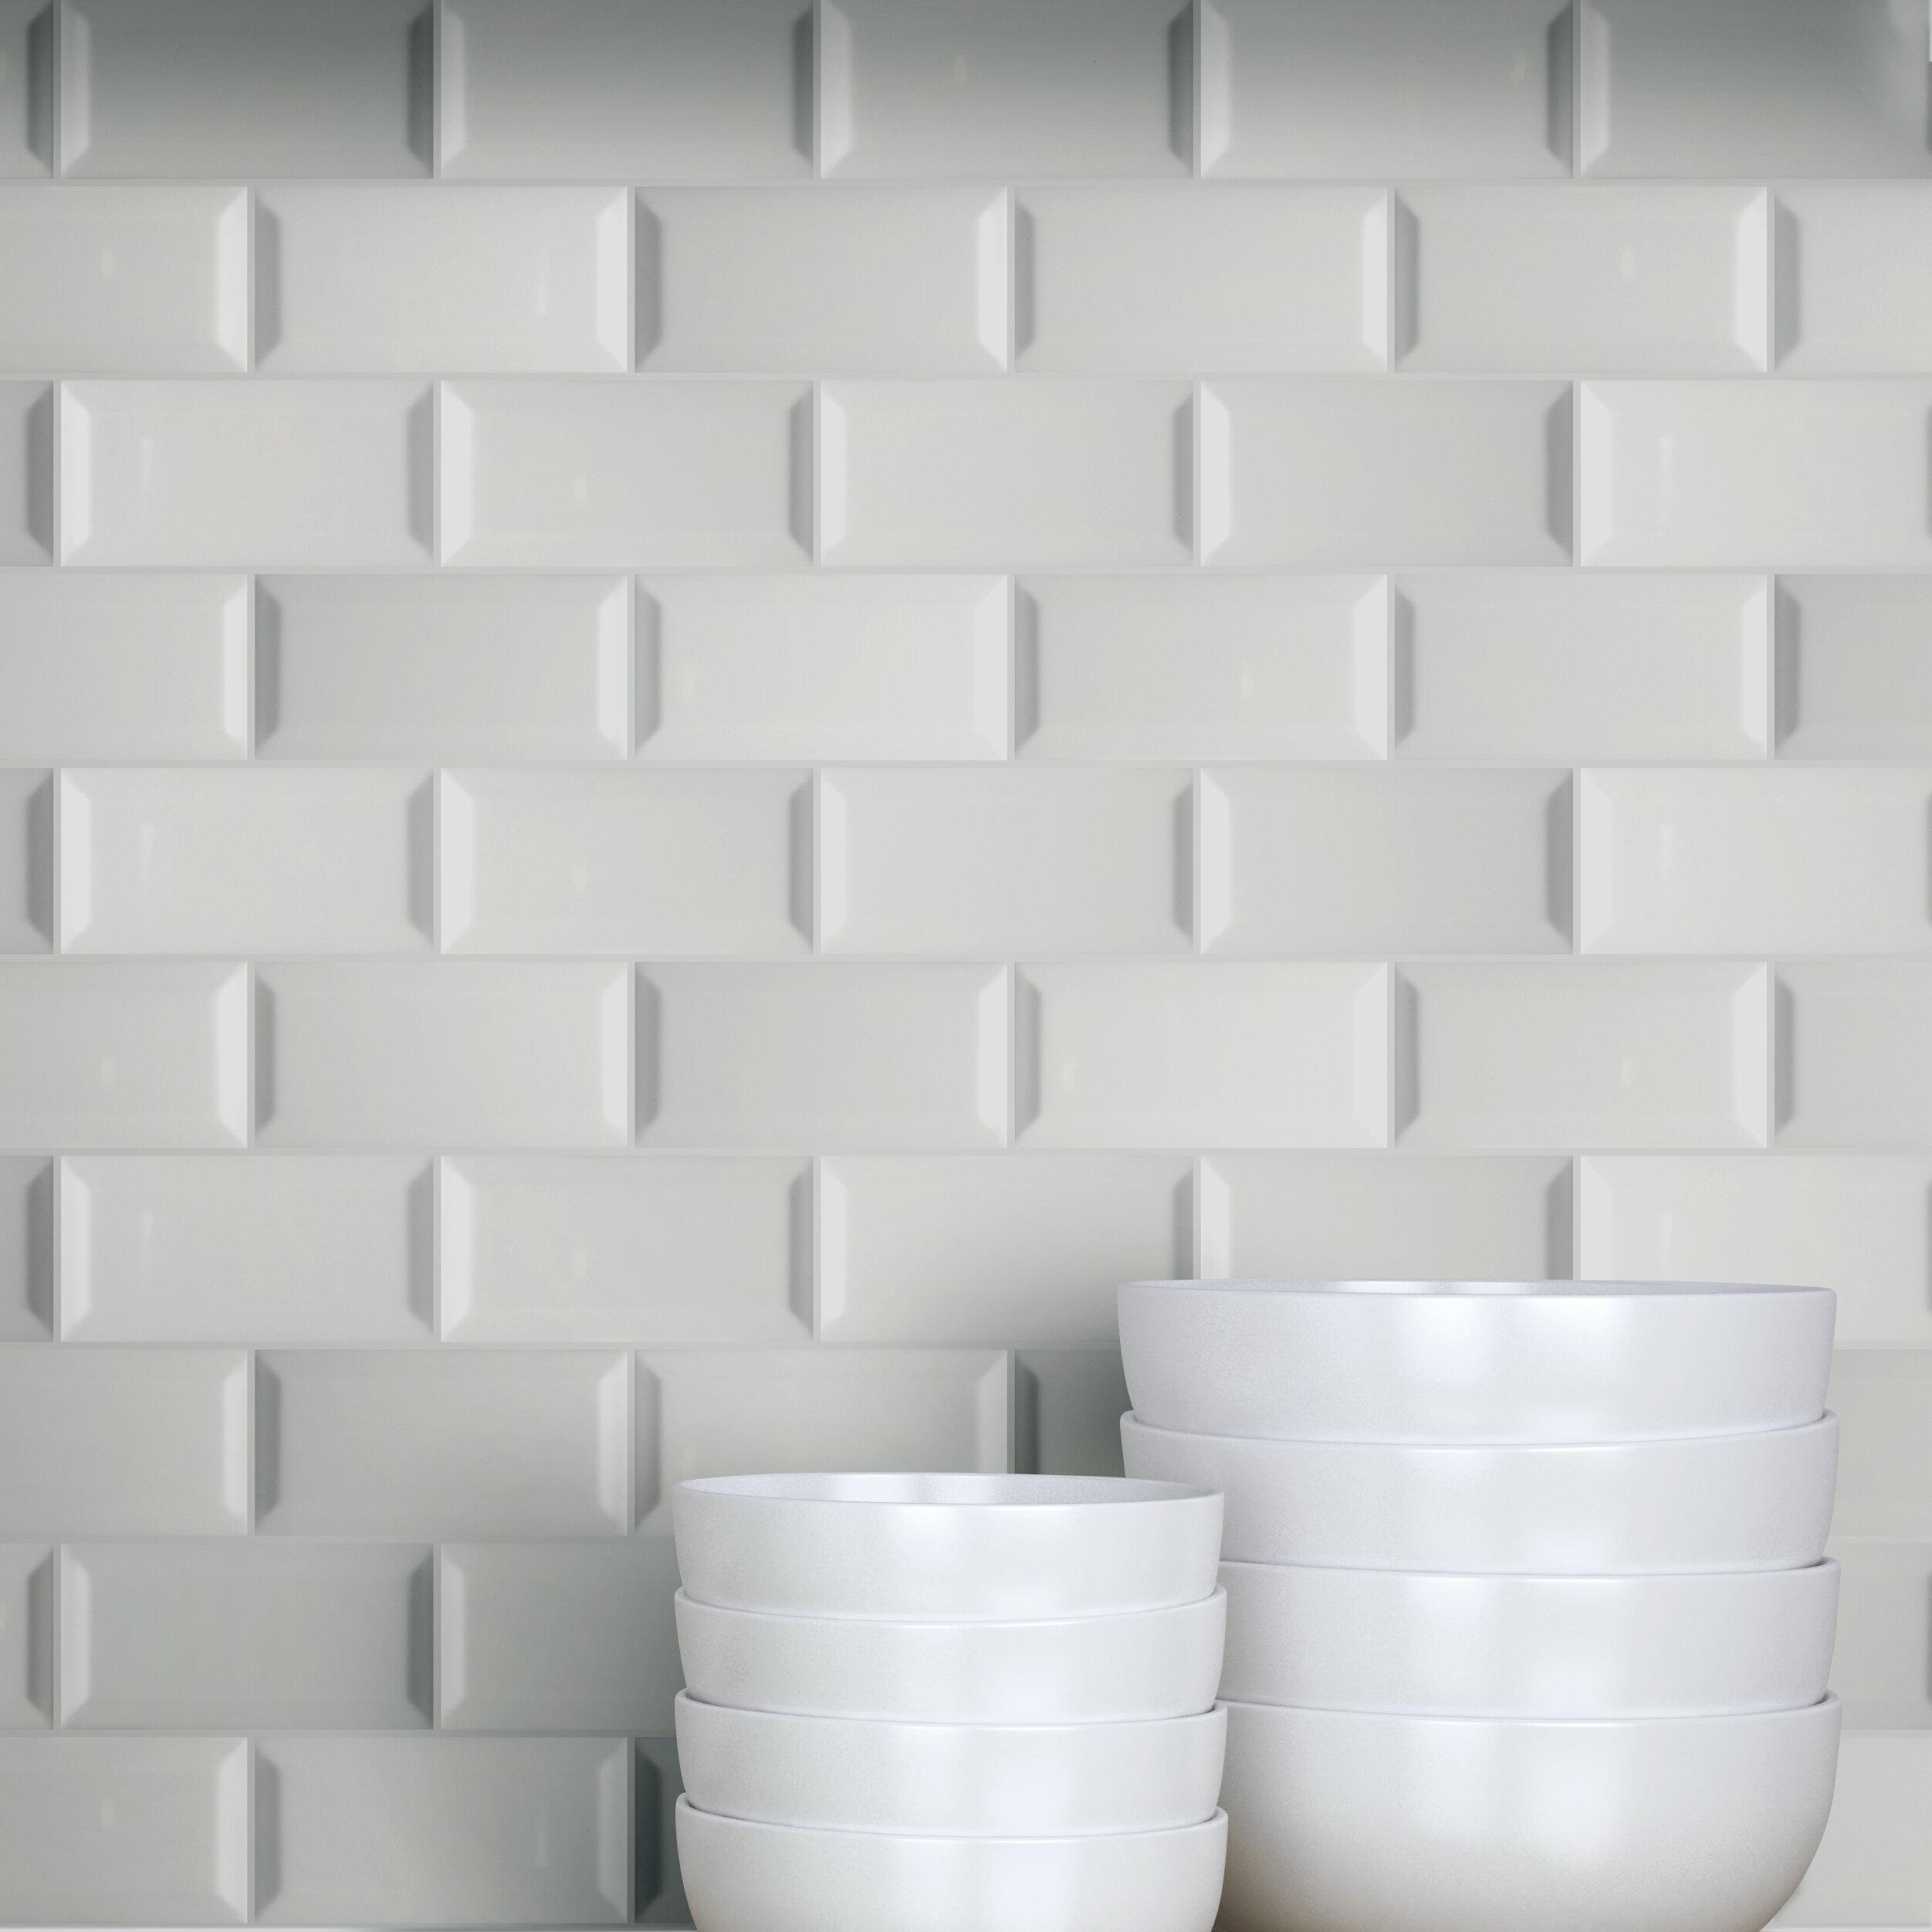 3 X 6 Beveled Ceramic Subway Tile In Glossy Gray